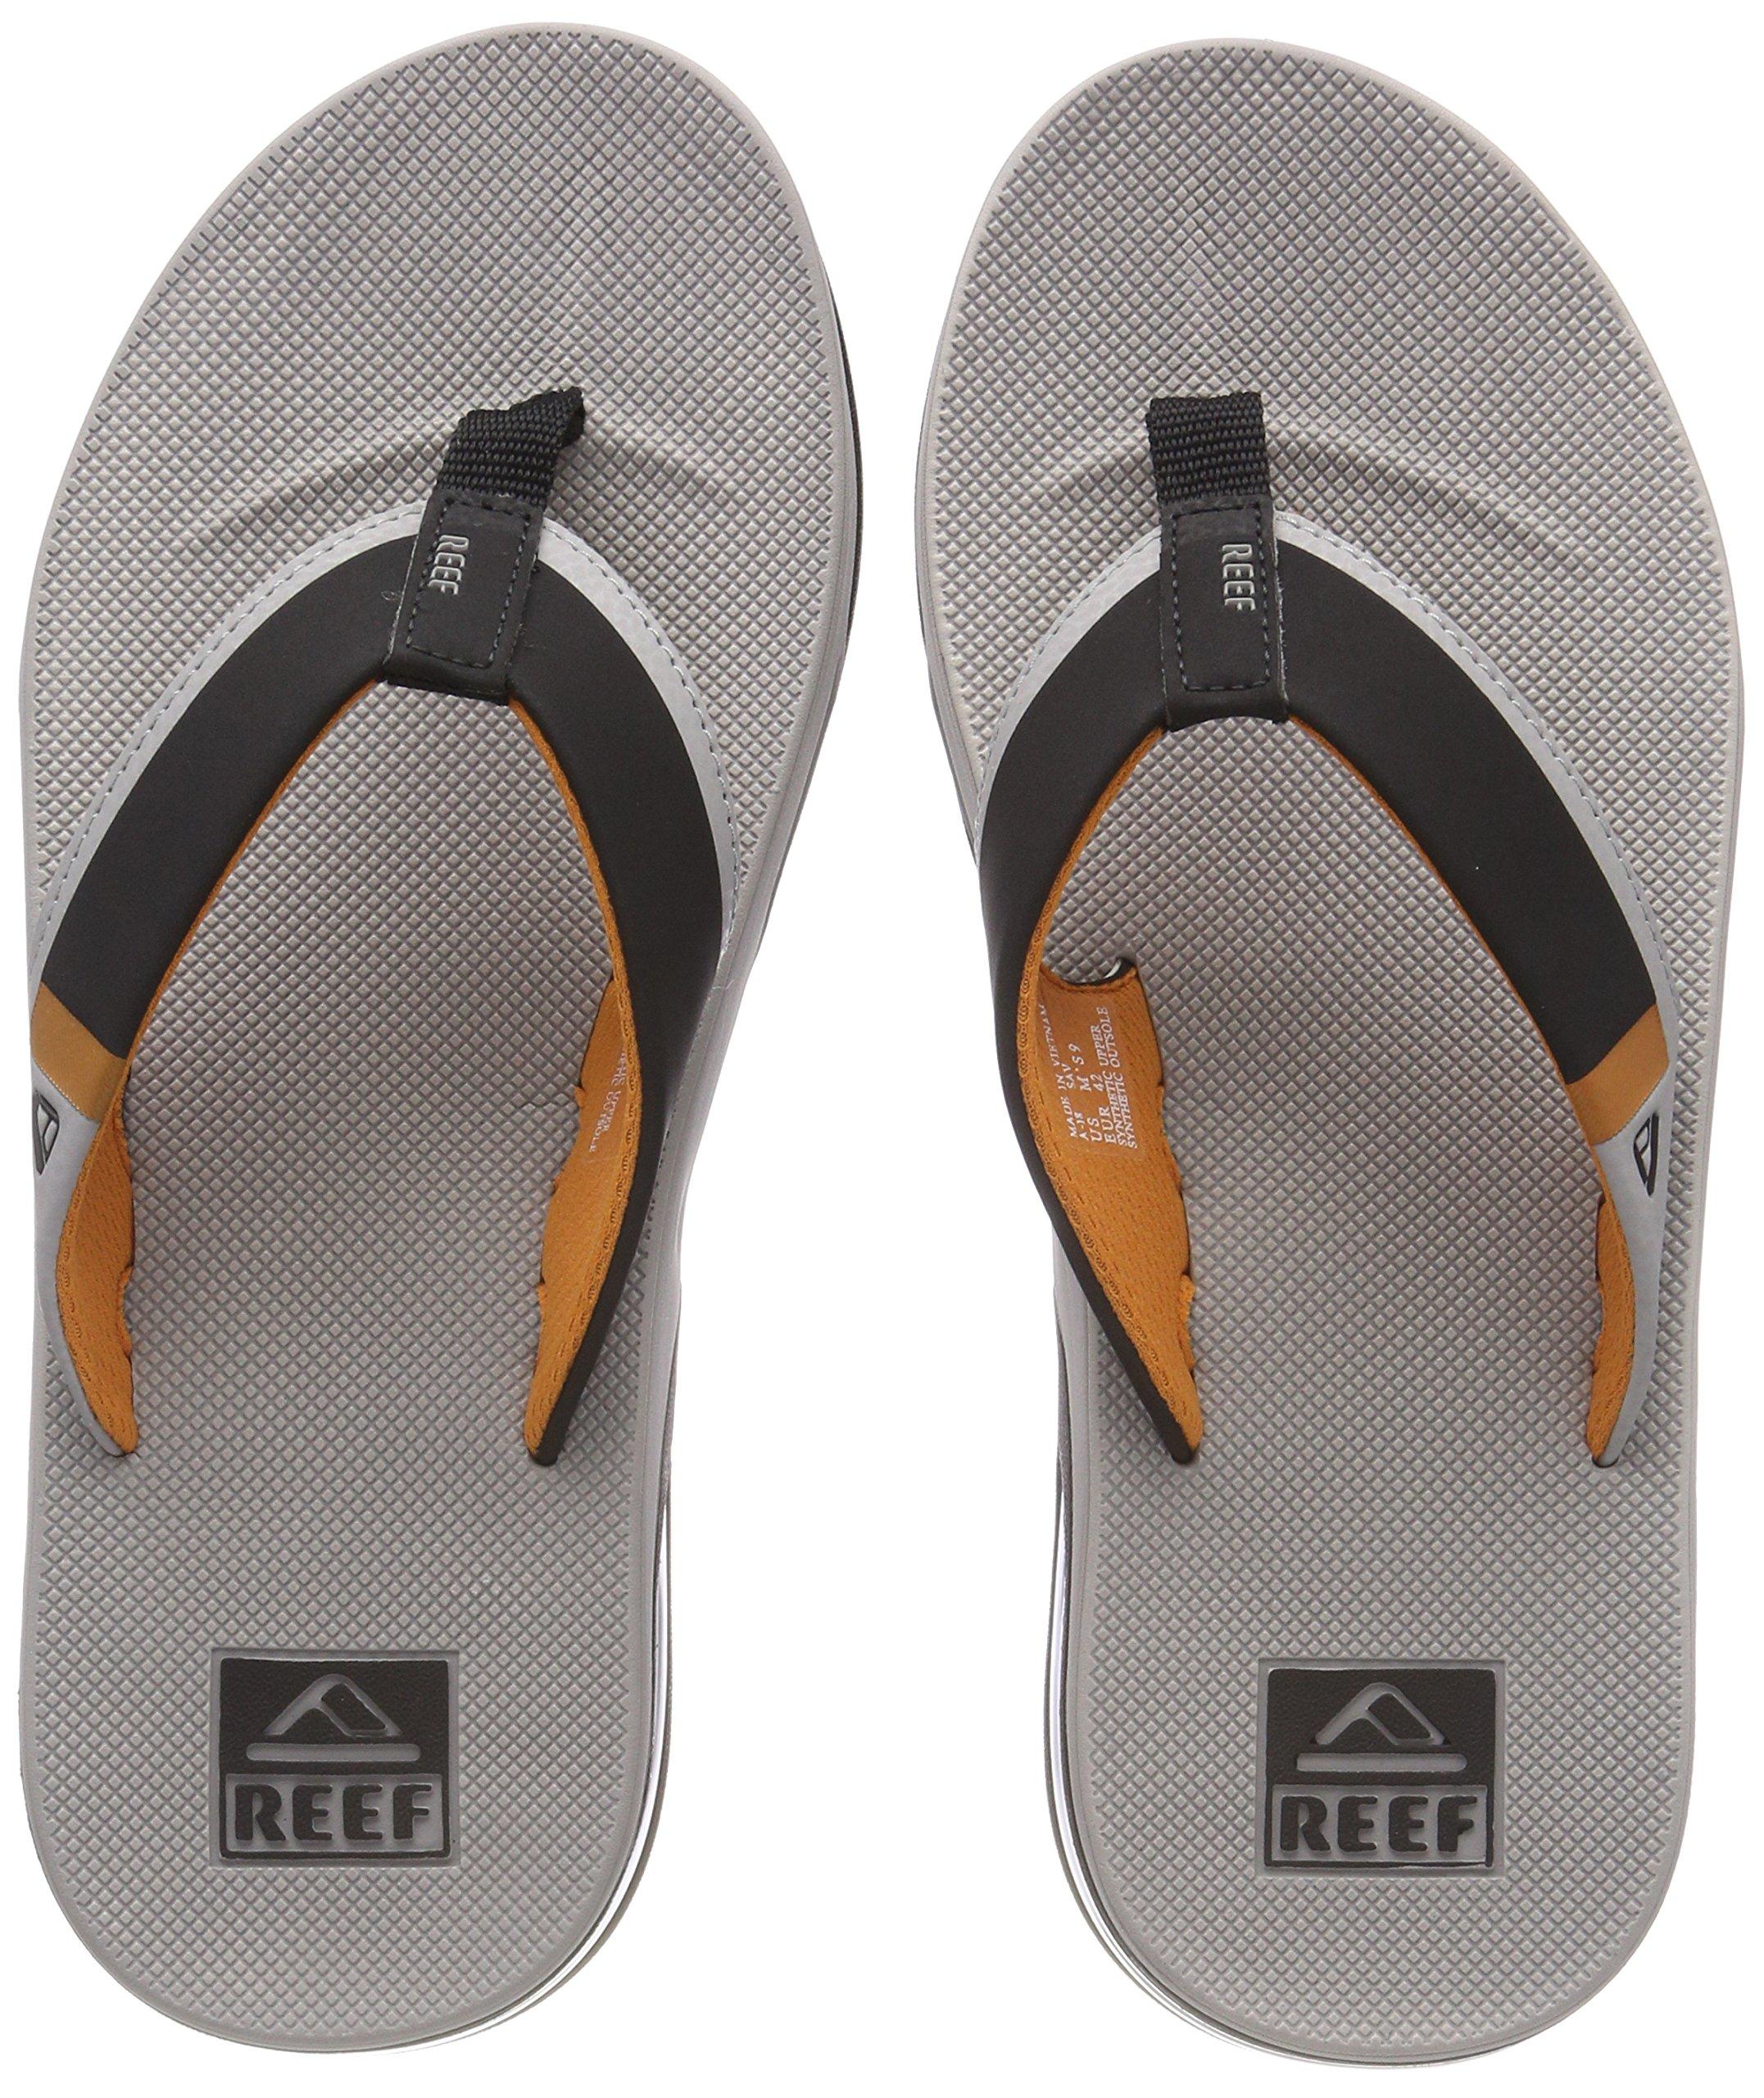 fe040d83d199 Galleon - Reef Men's Fanning Low Sandal (8 D(M) US, Grey/Orange)